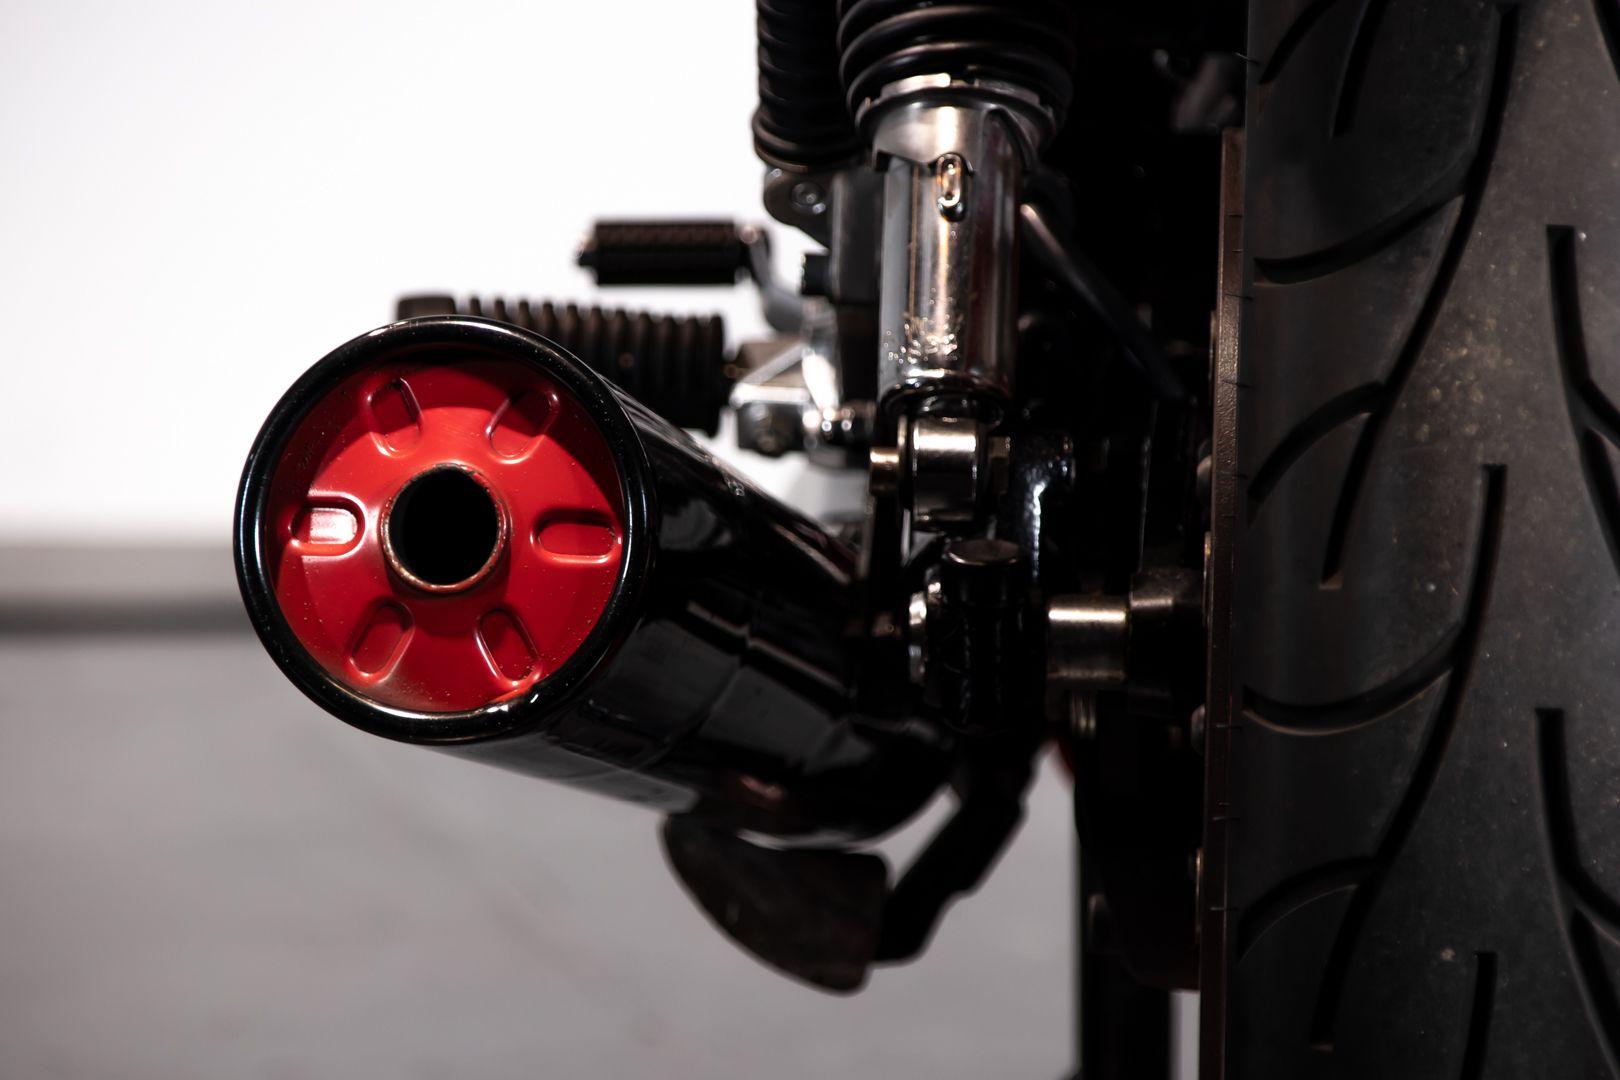 1985 Moto Guzzi le mans 1000 57538